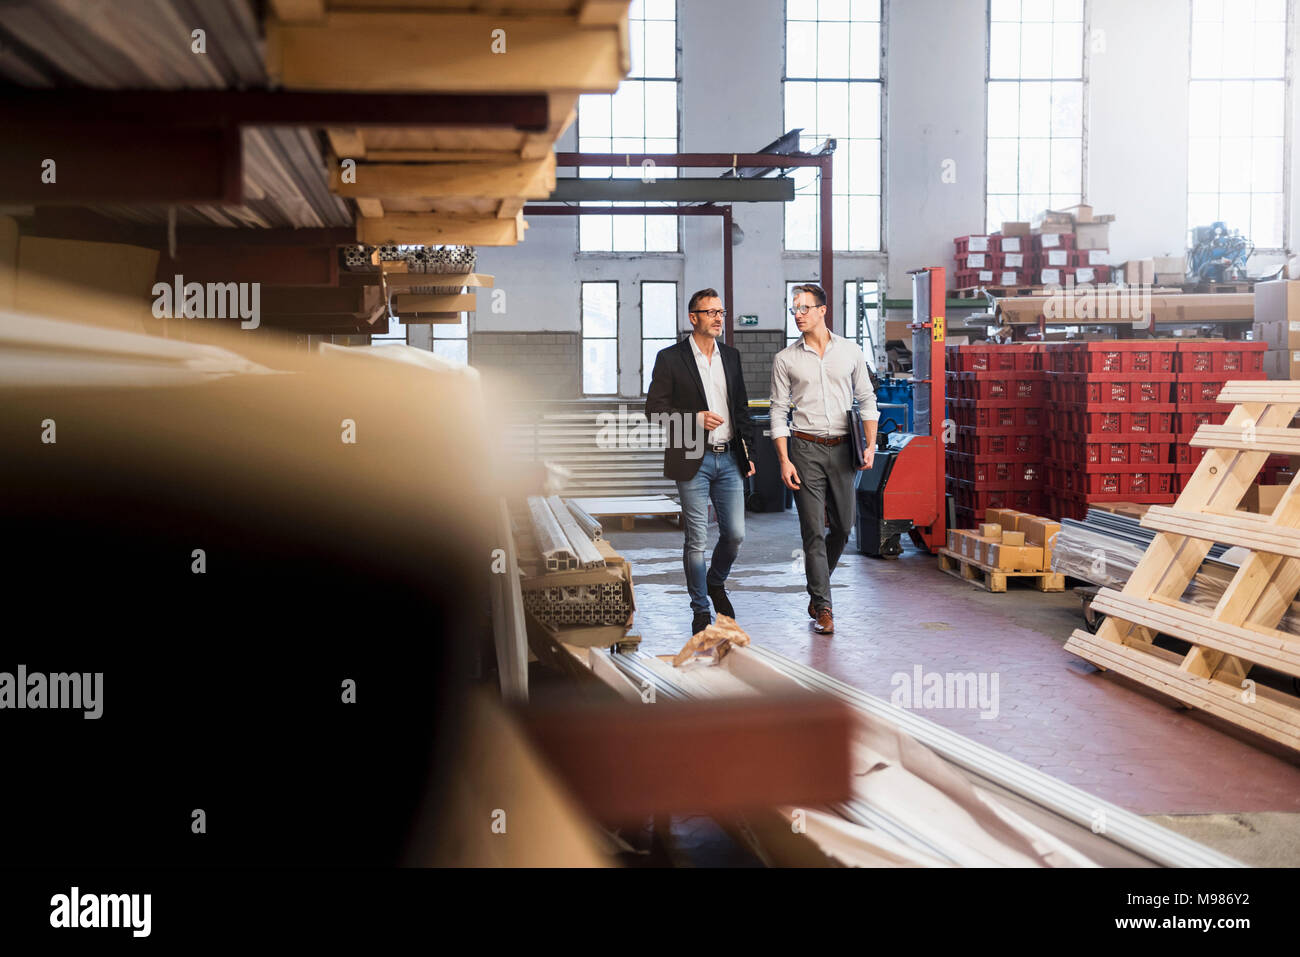 Two businessmen walking in factory storeroom - Stock Image